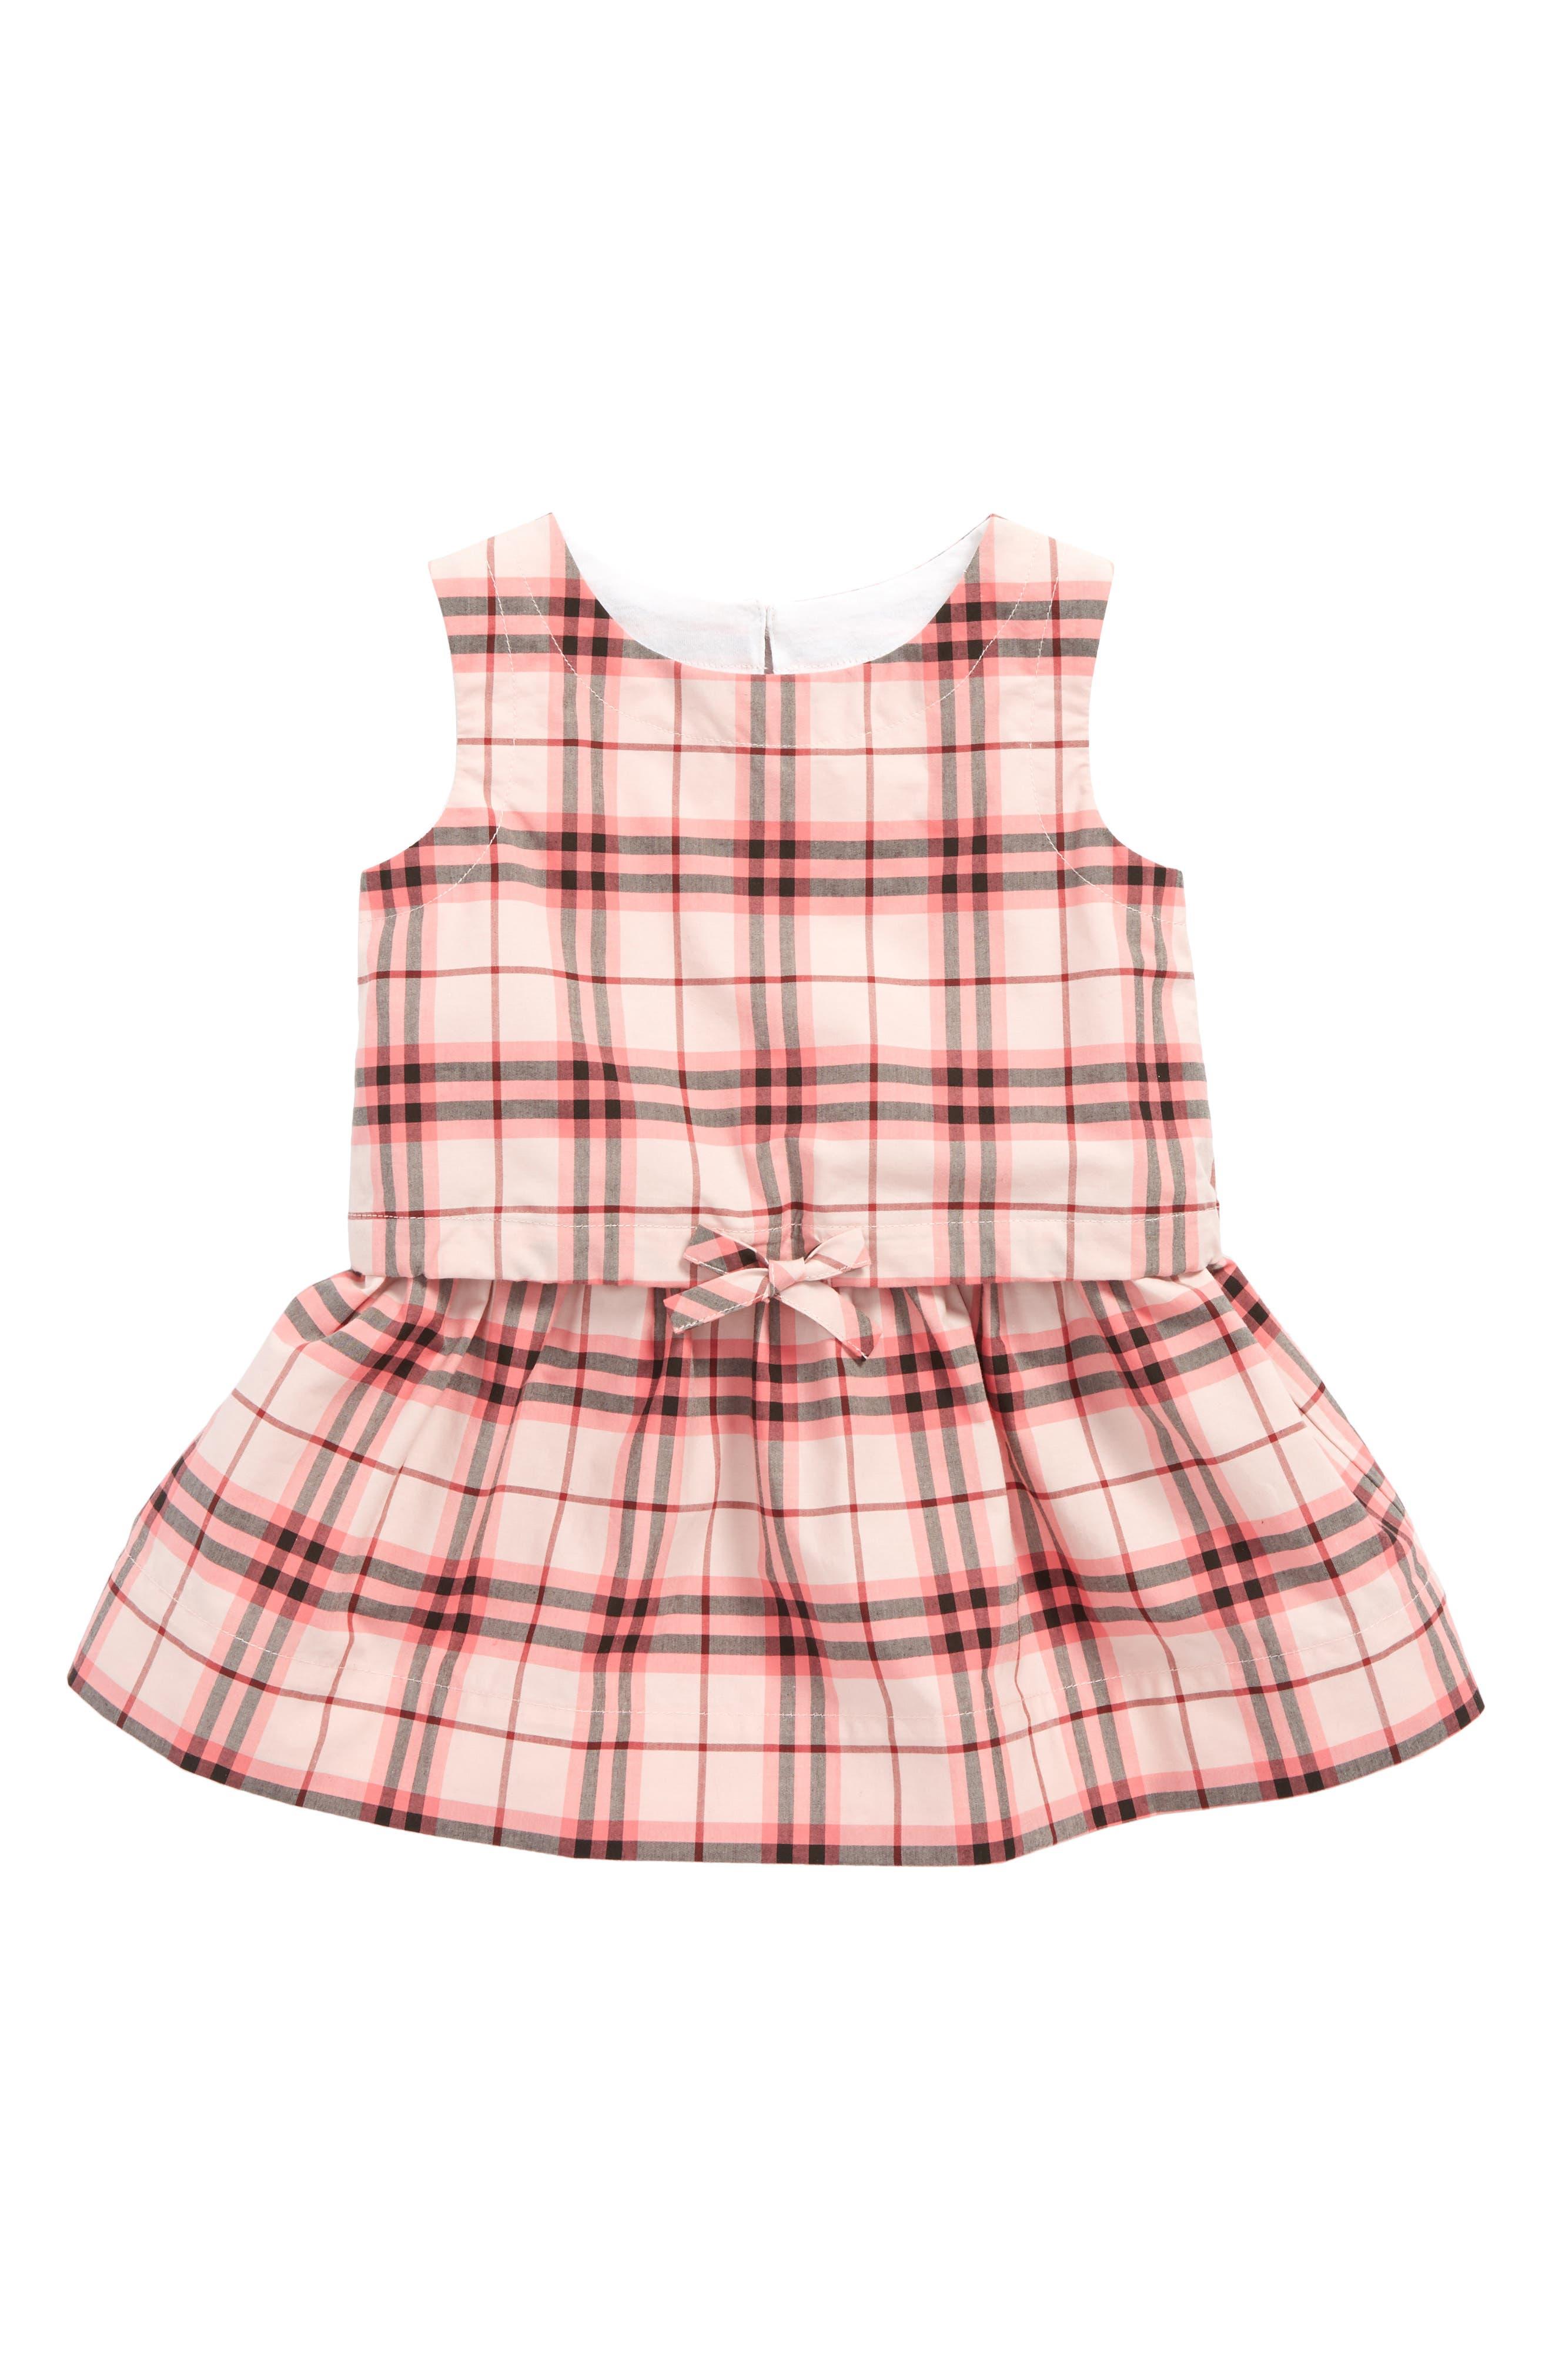 Burberry Mabel Check Dress (Baby Girls)